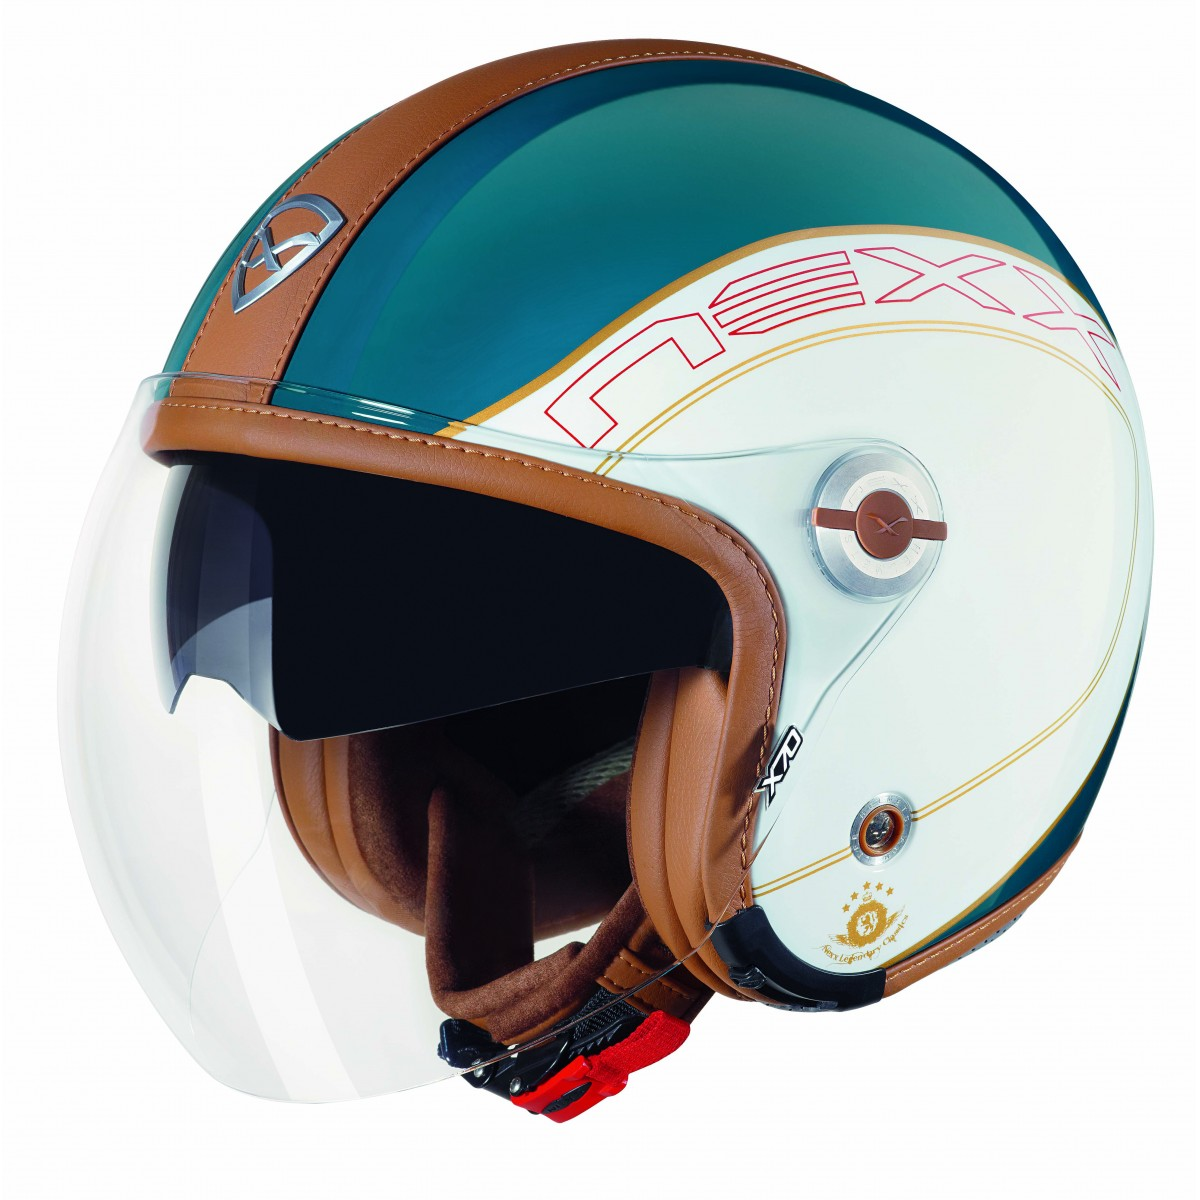 Capacete Nexx X70 Ace Azul Retrô Brilhante  - Super Bike - Loja Oficial Alpinestars